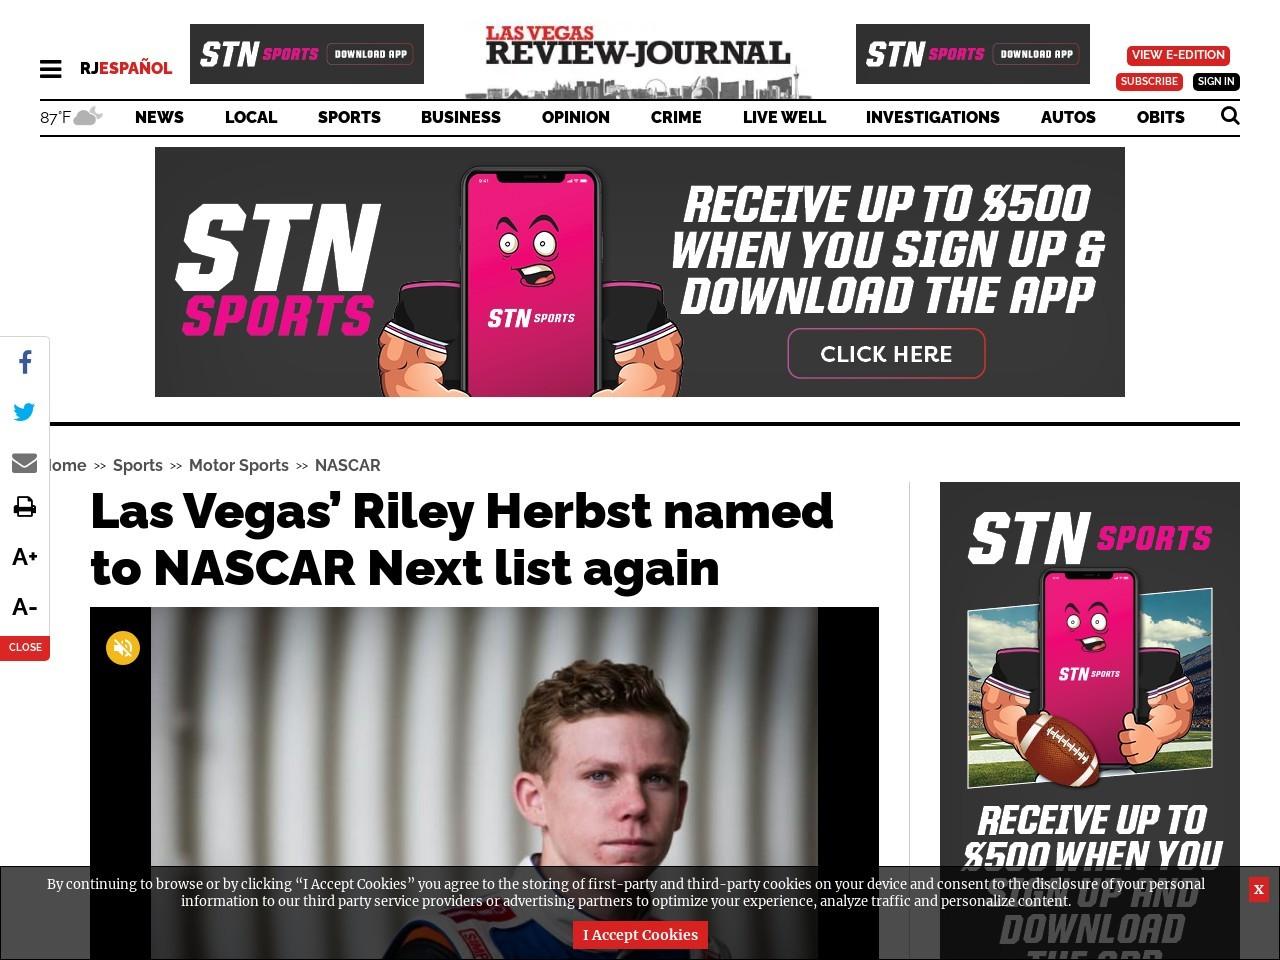 Las Vegas' Riley Herbst named to NASCAR Next list again